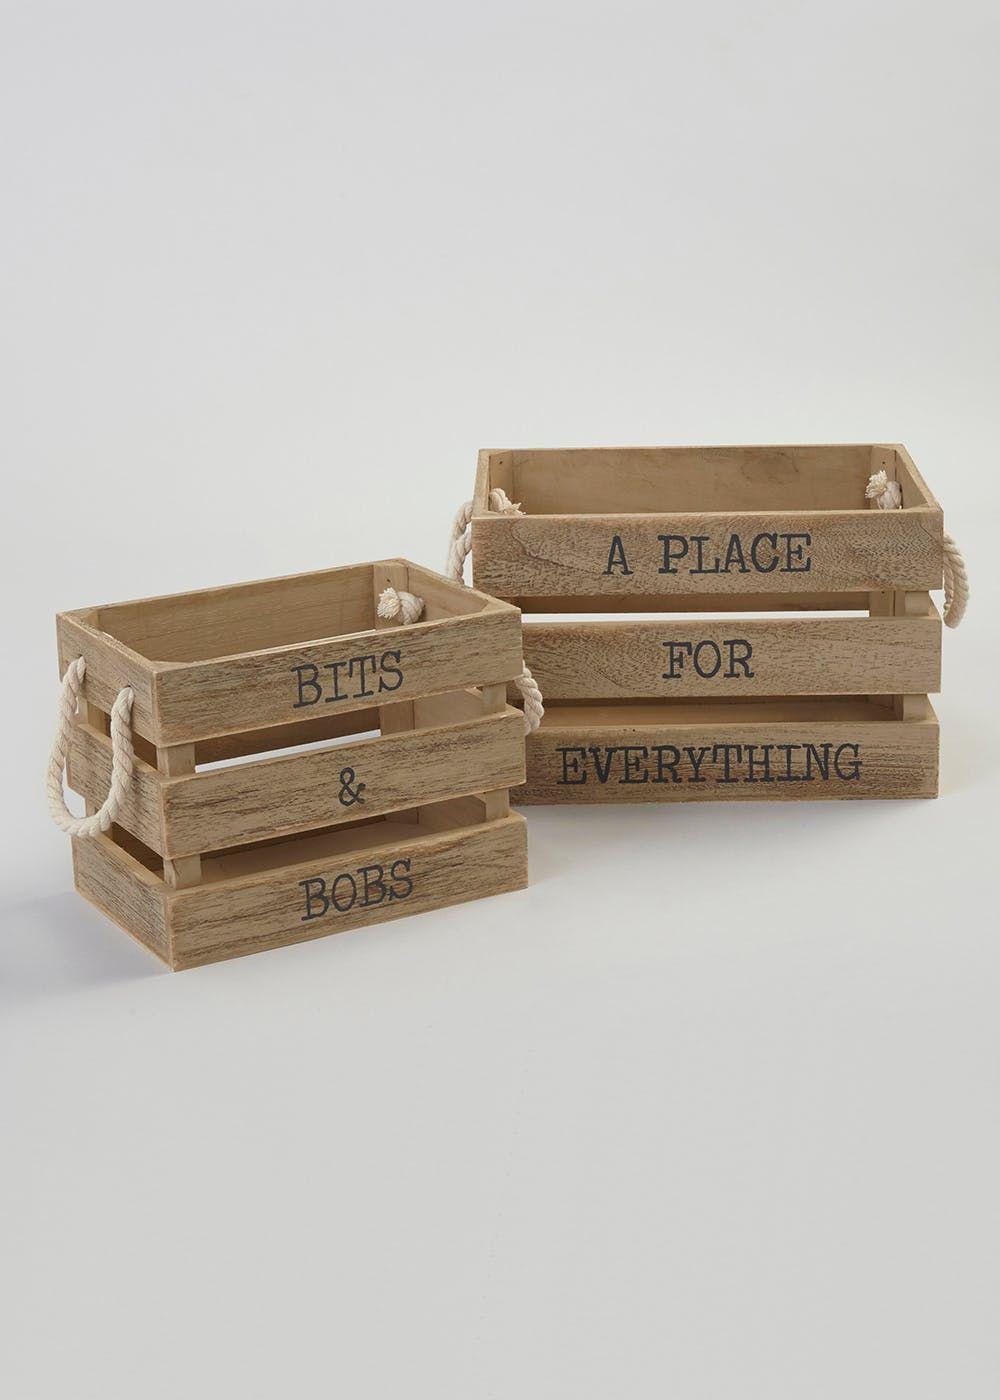 Best Homeware Wooden Storage Boxes Home Furnishing 400 x 300